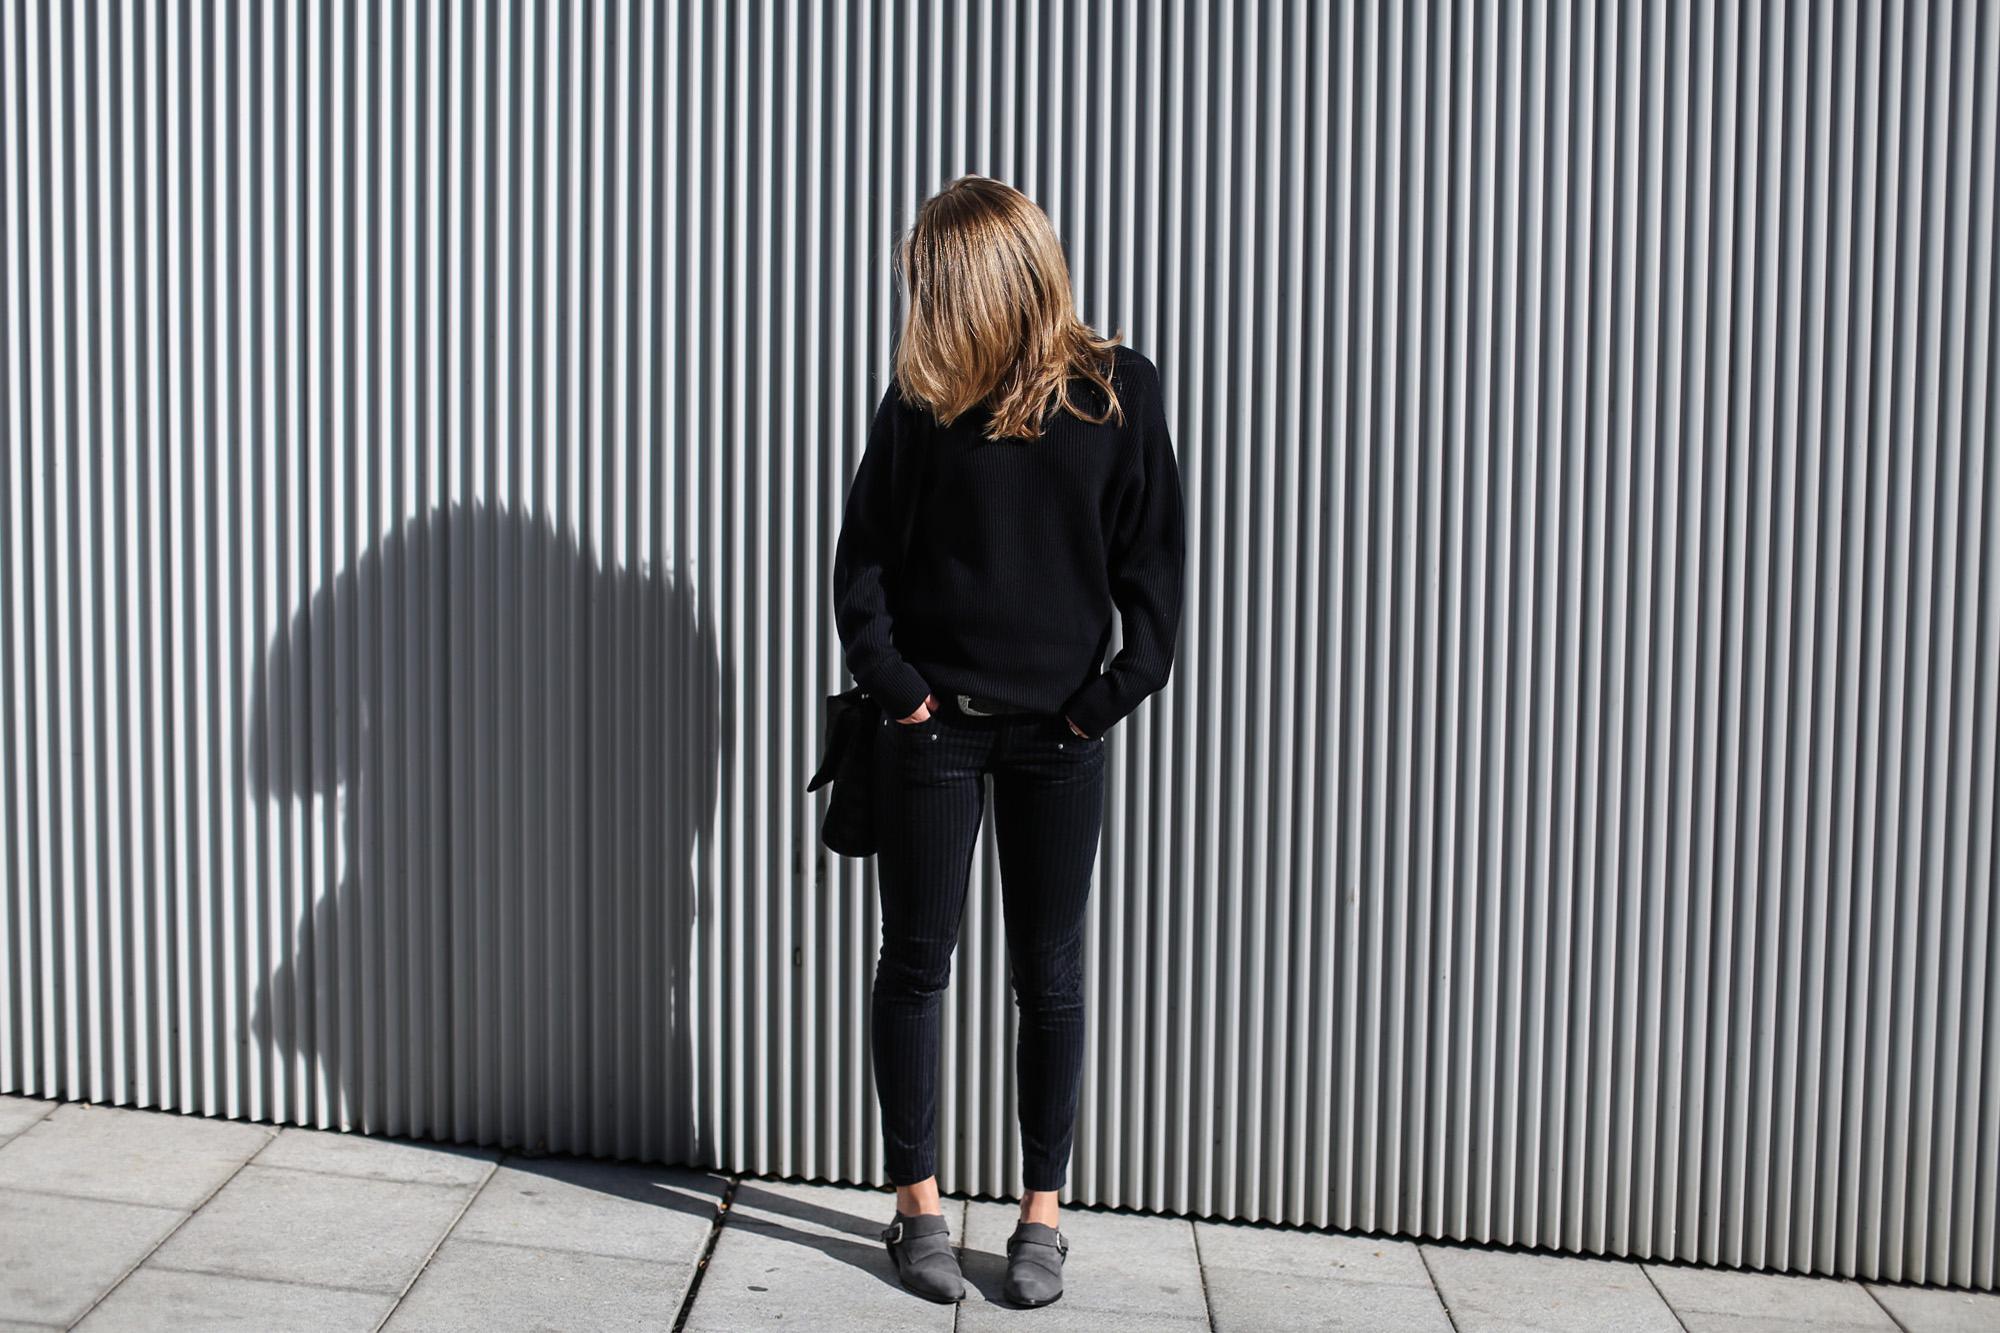 Clochet_streetstyle_muitt_madrid_zapatos_oxford_abrigo_masscob_lacoruña_trimmerbilbao-8